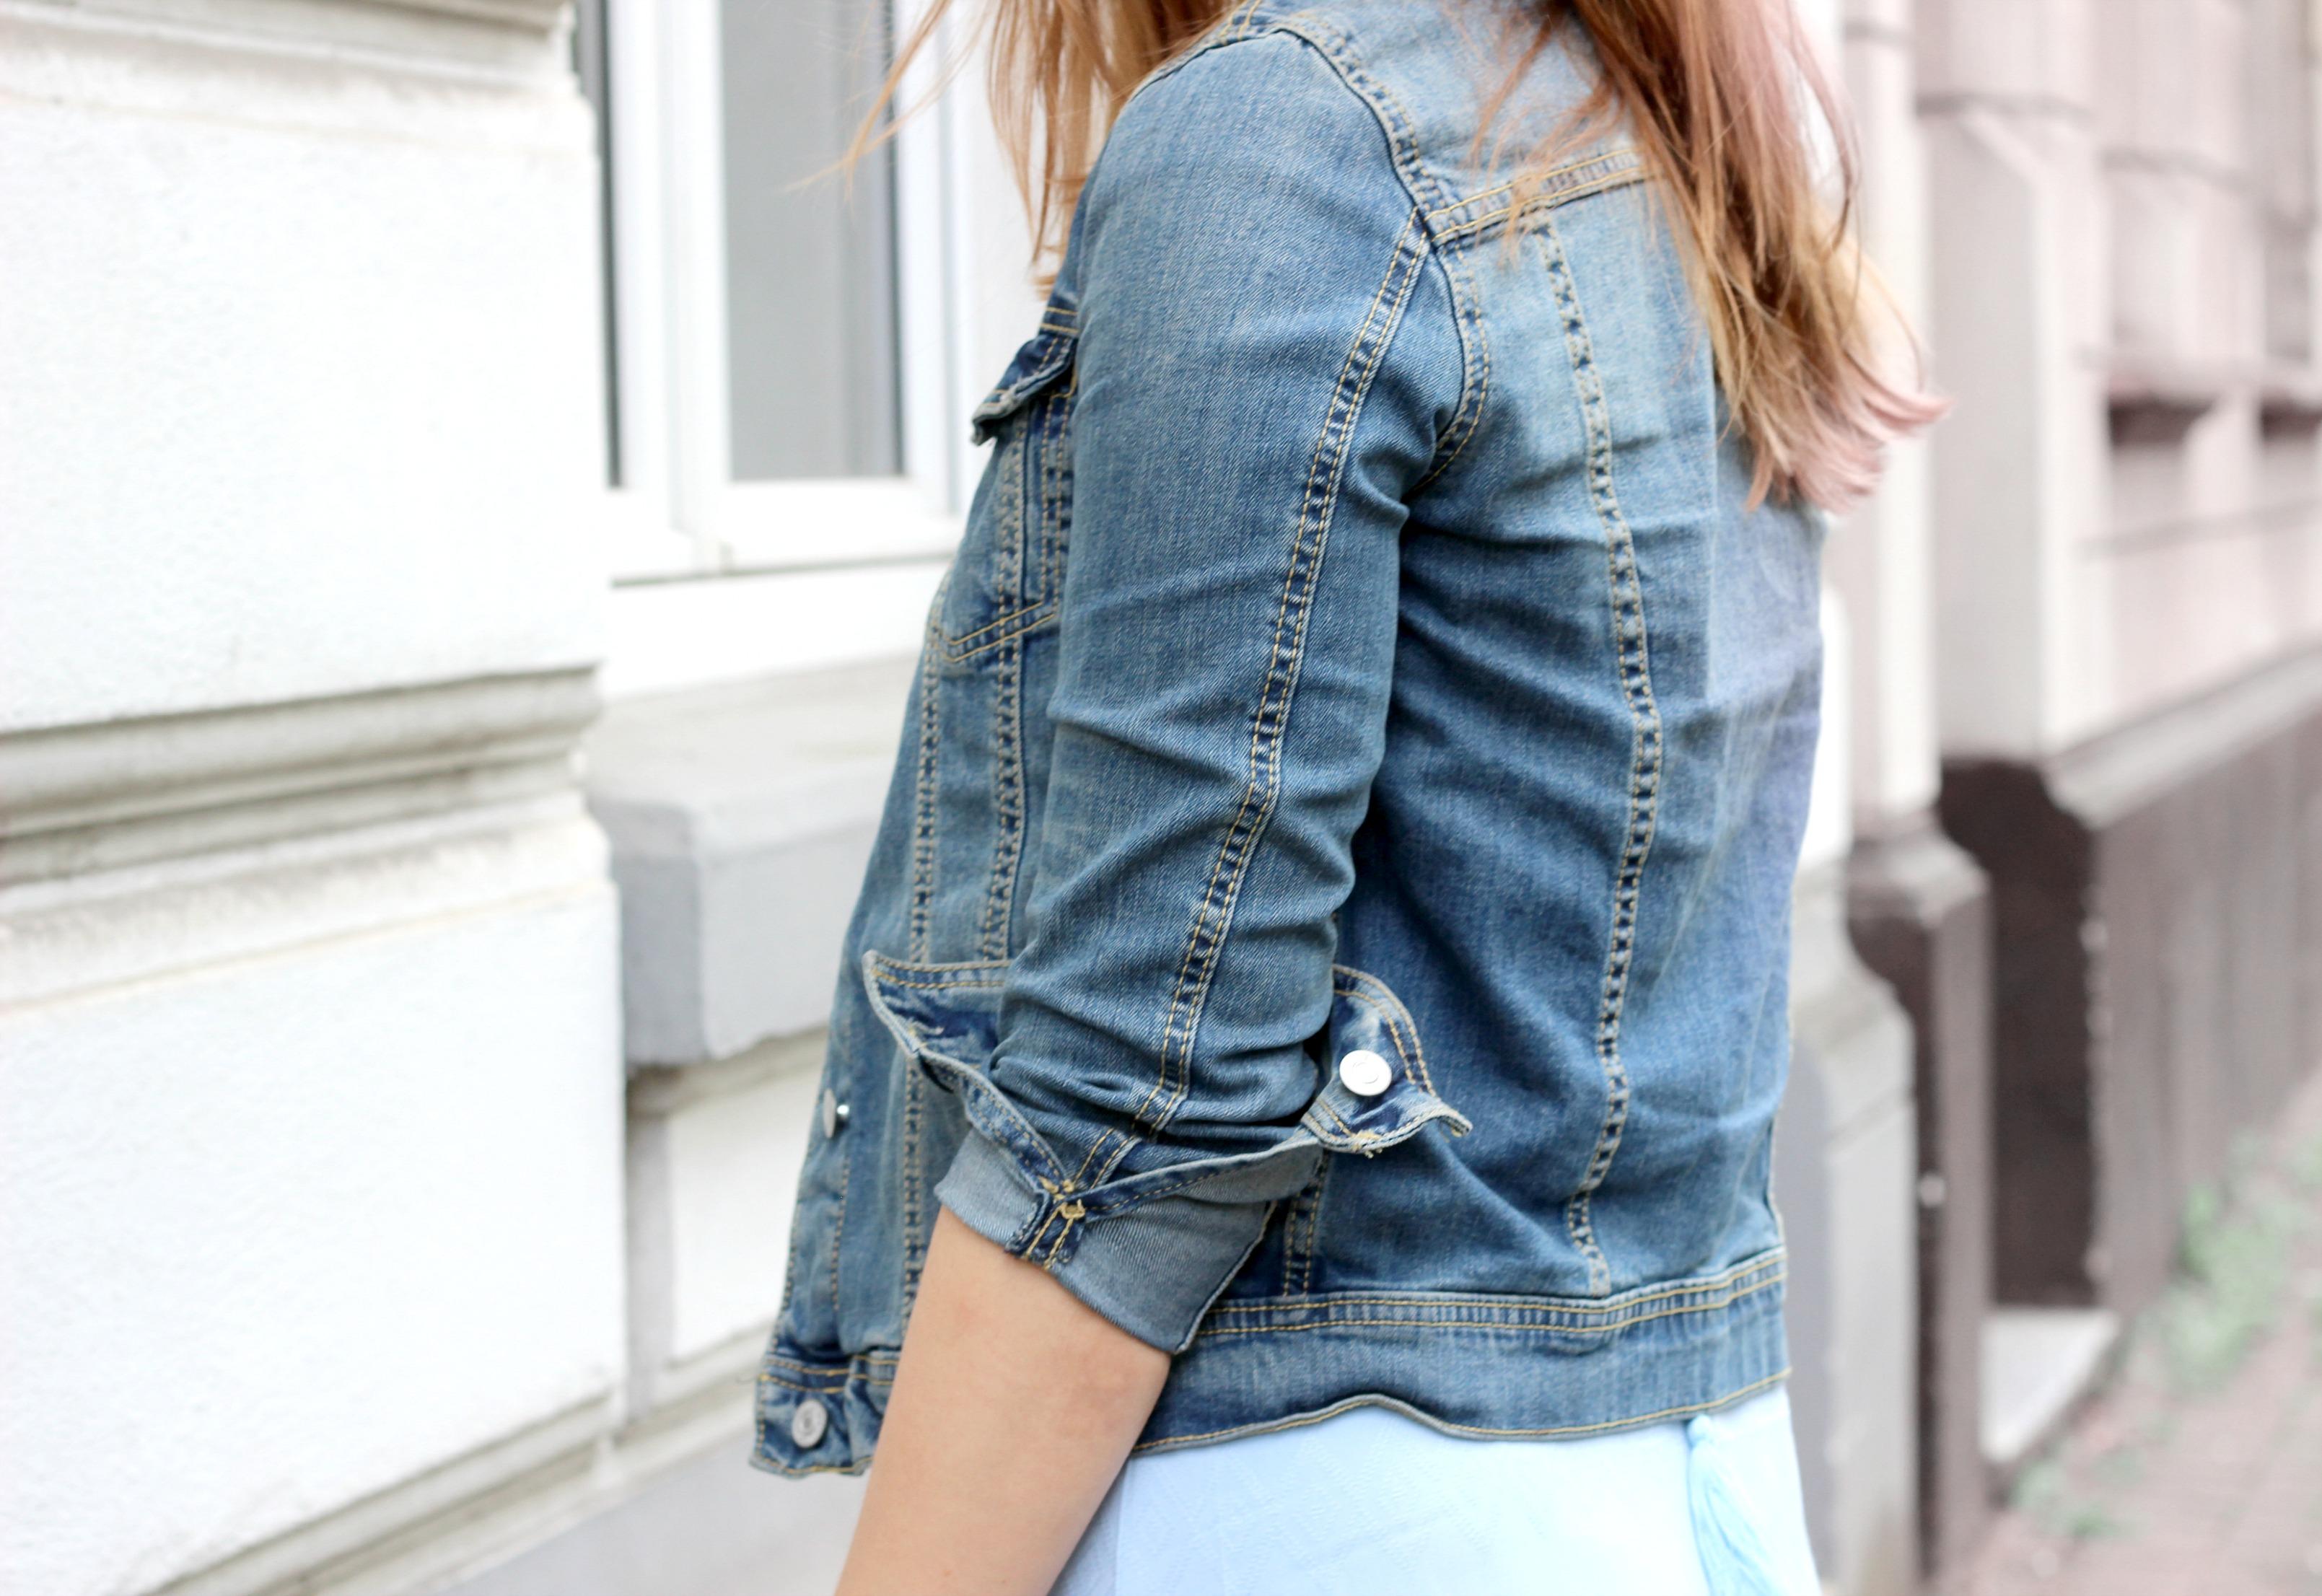 Fashionblog Koeln_Modeblog_Blaues Kleid_Jeansjacke_4